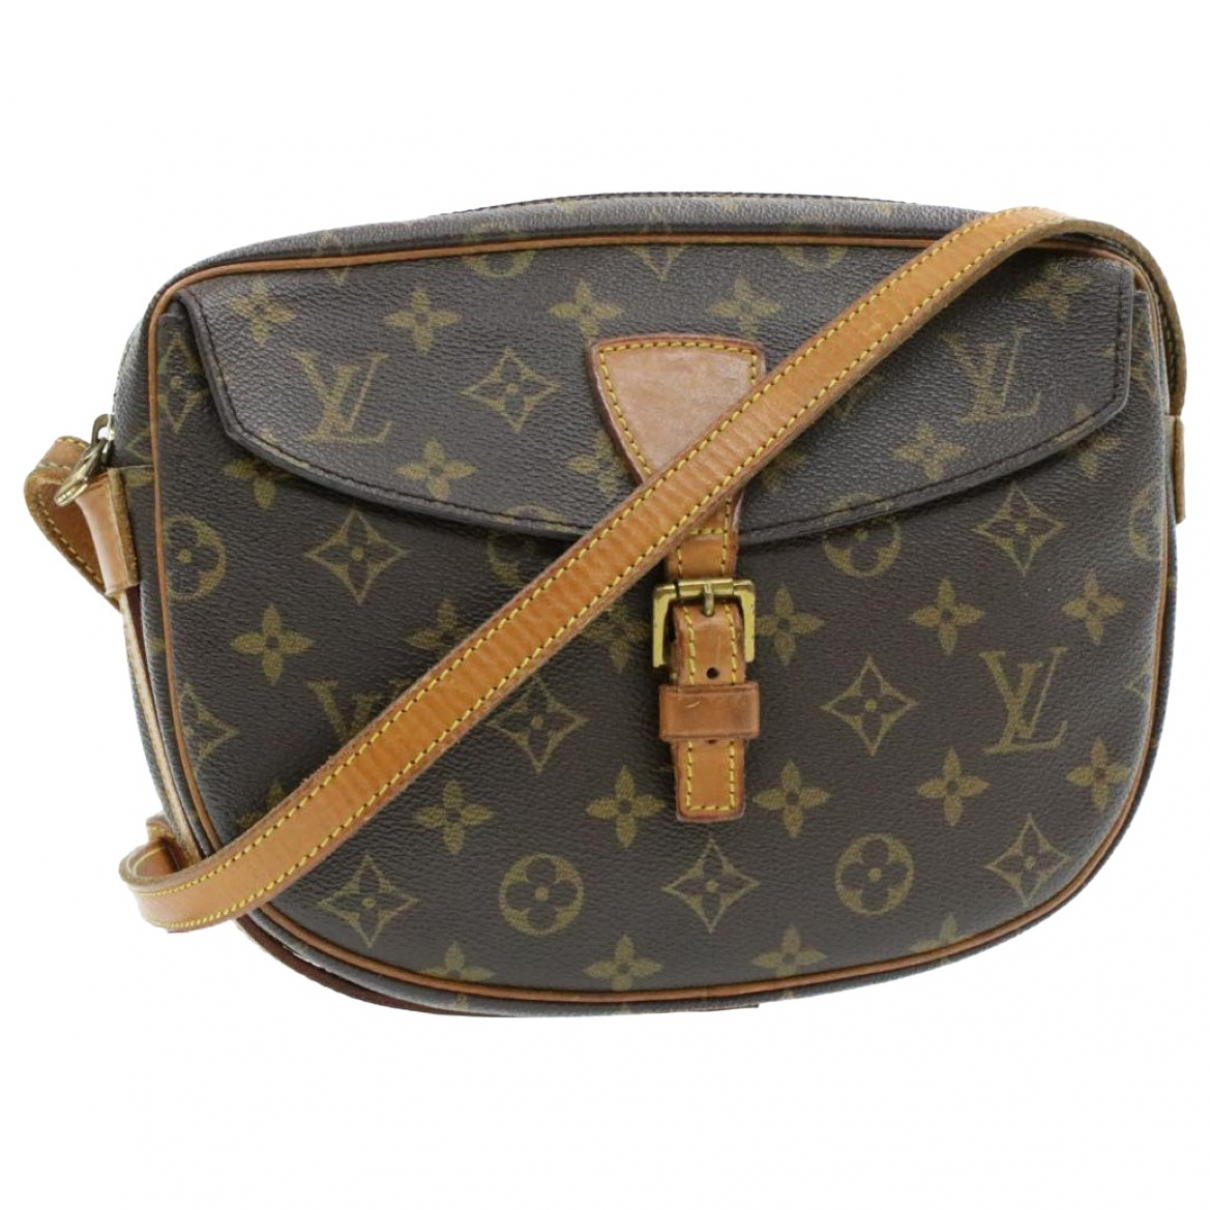 Louis Vuitton Jeune fille  Handtasche in  Braun Leinen